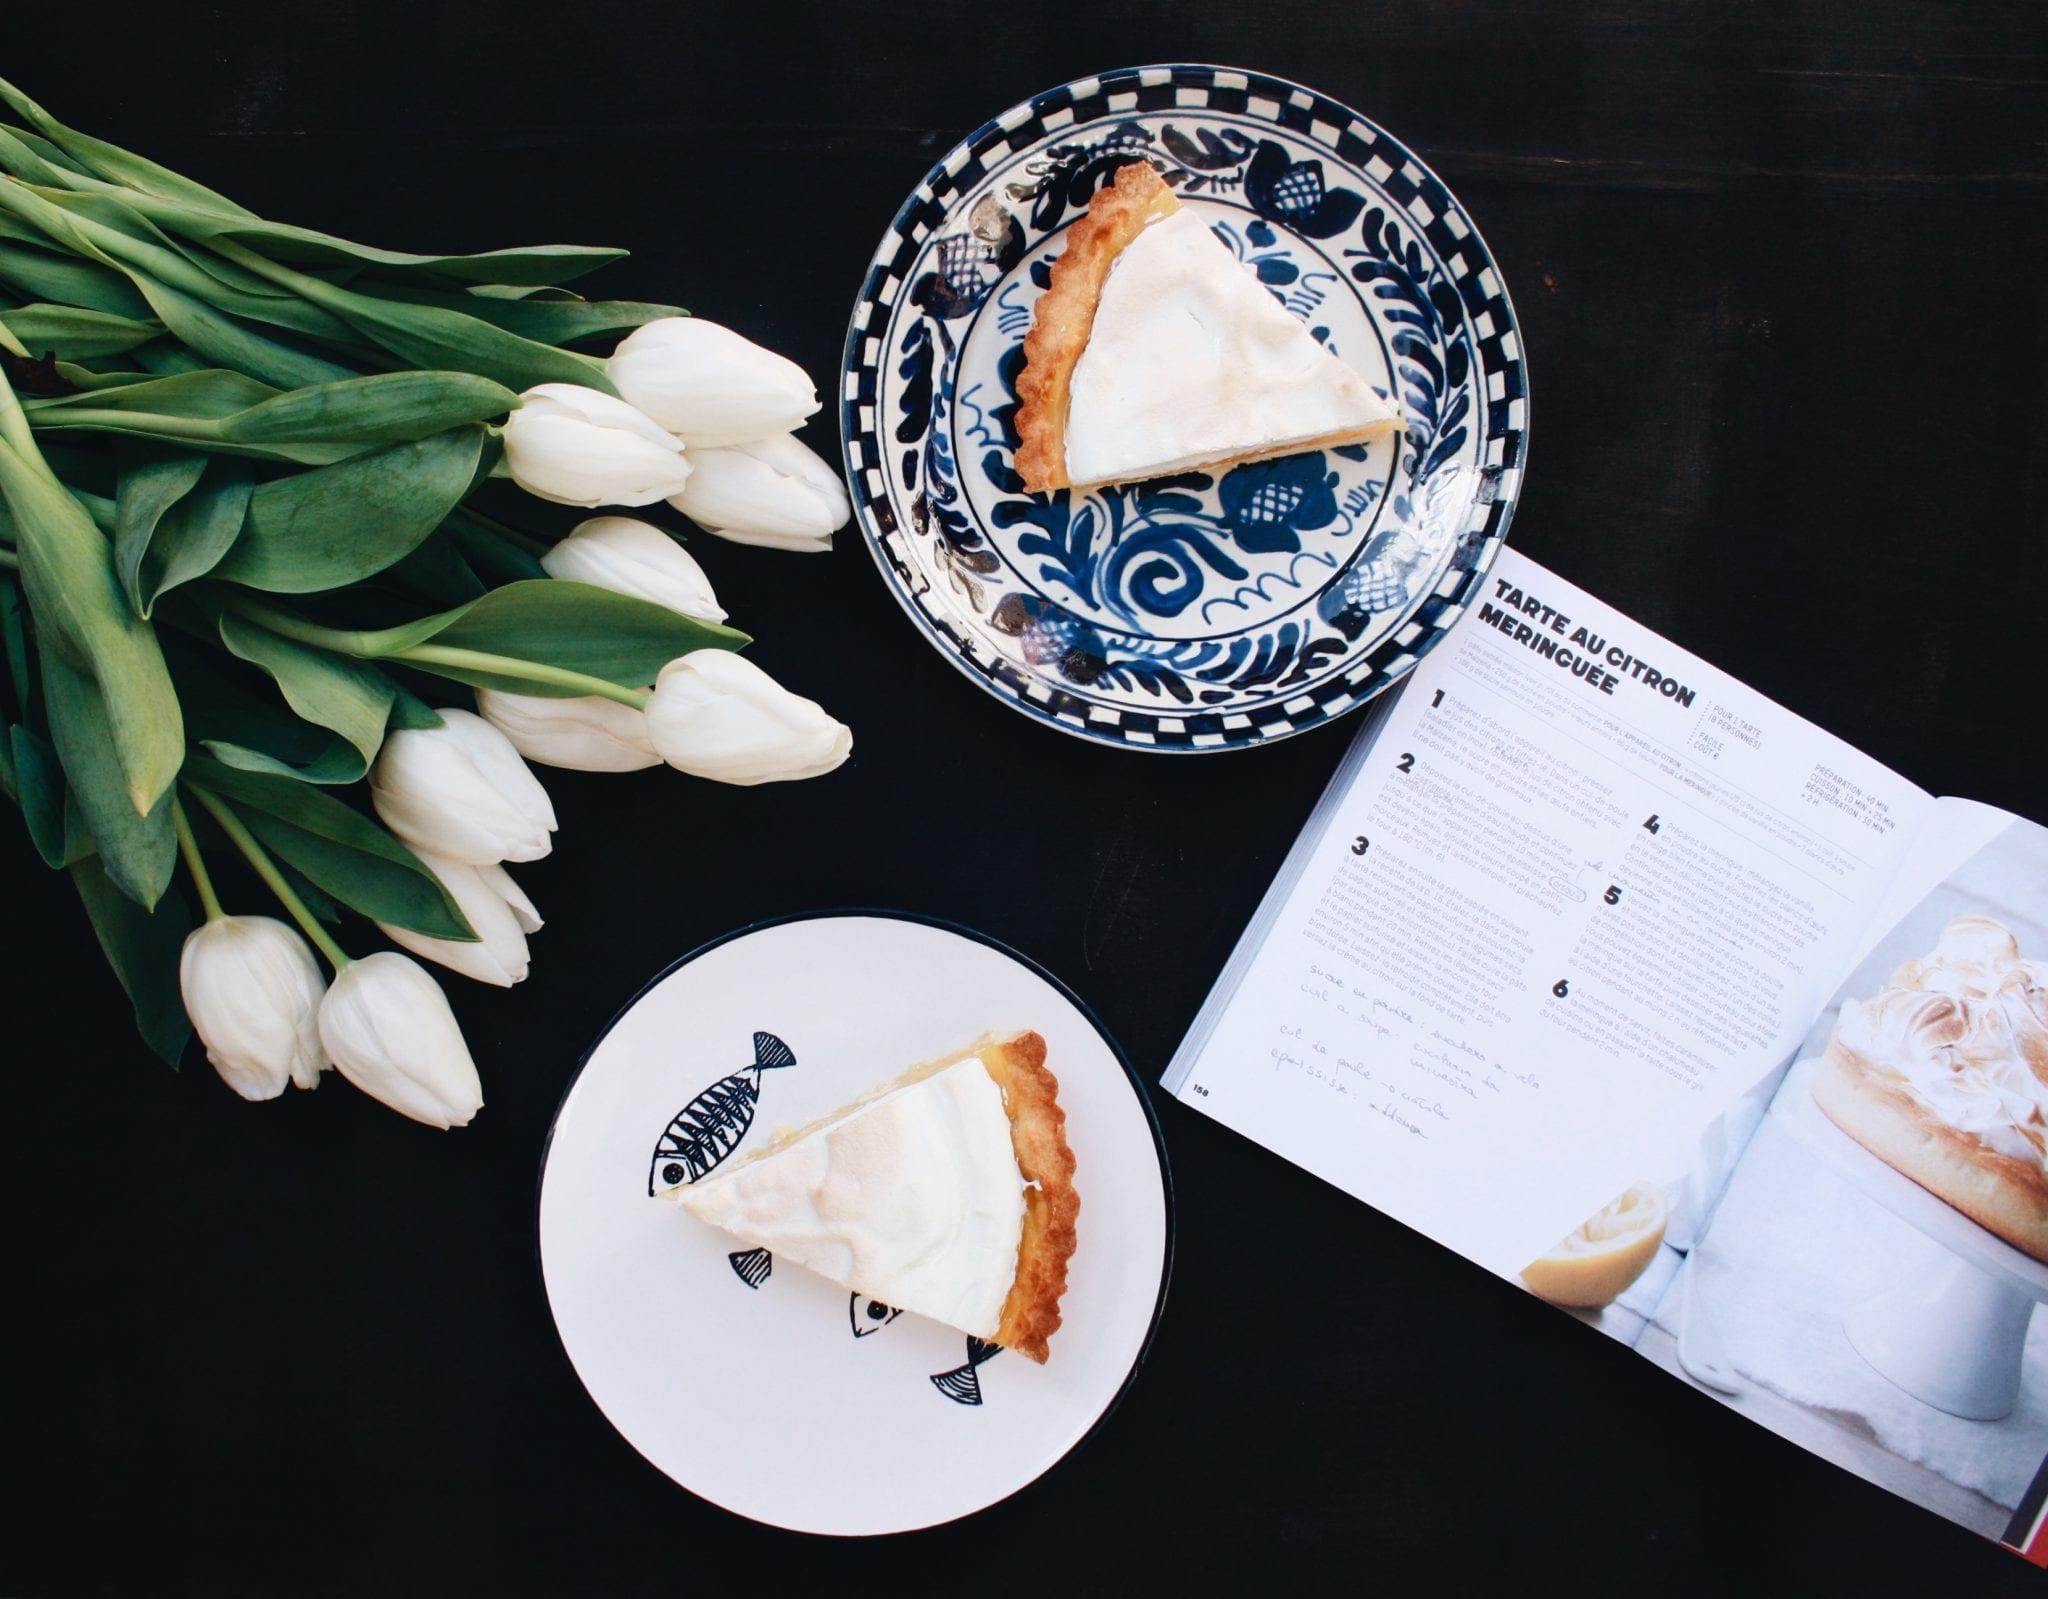 merenda con tarte au citron meringuée - Cuor di Biscotto - Le Plume